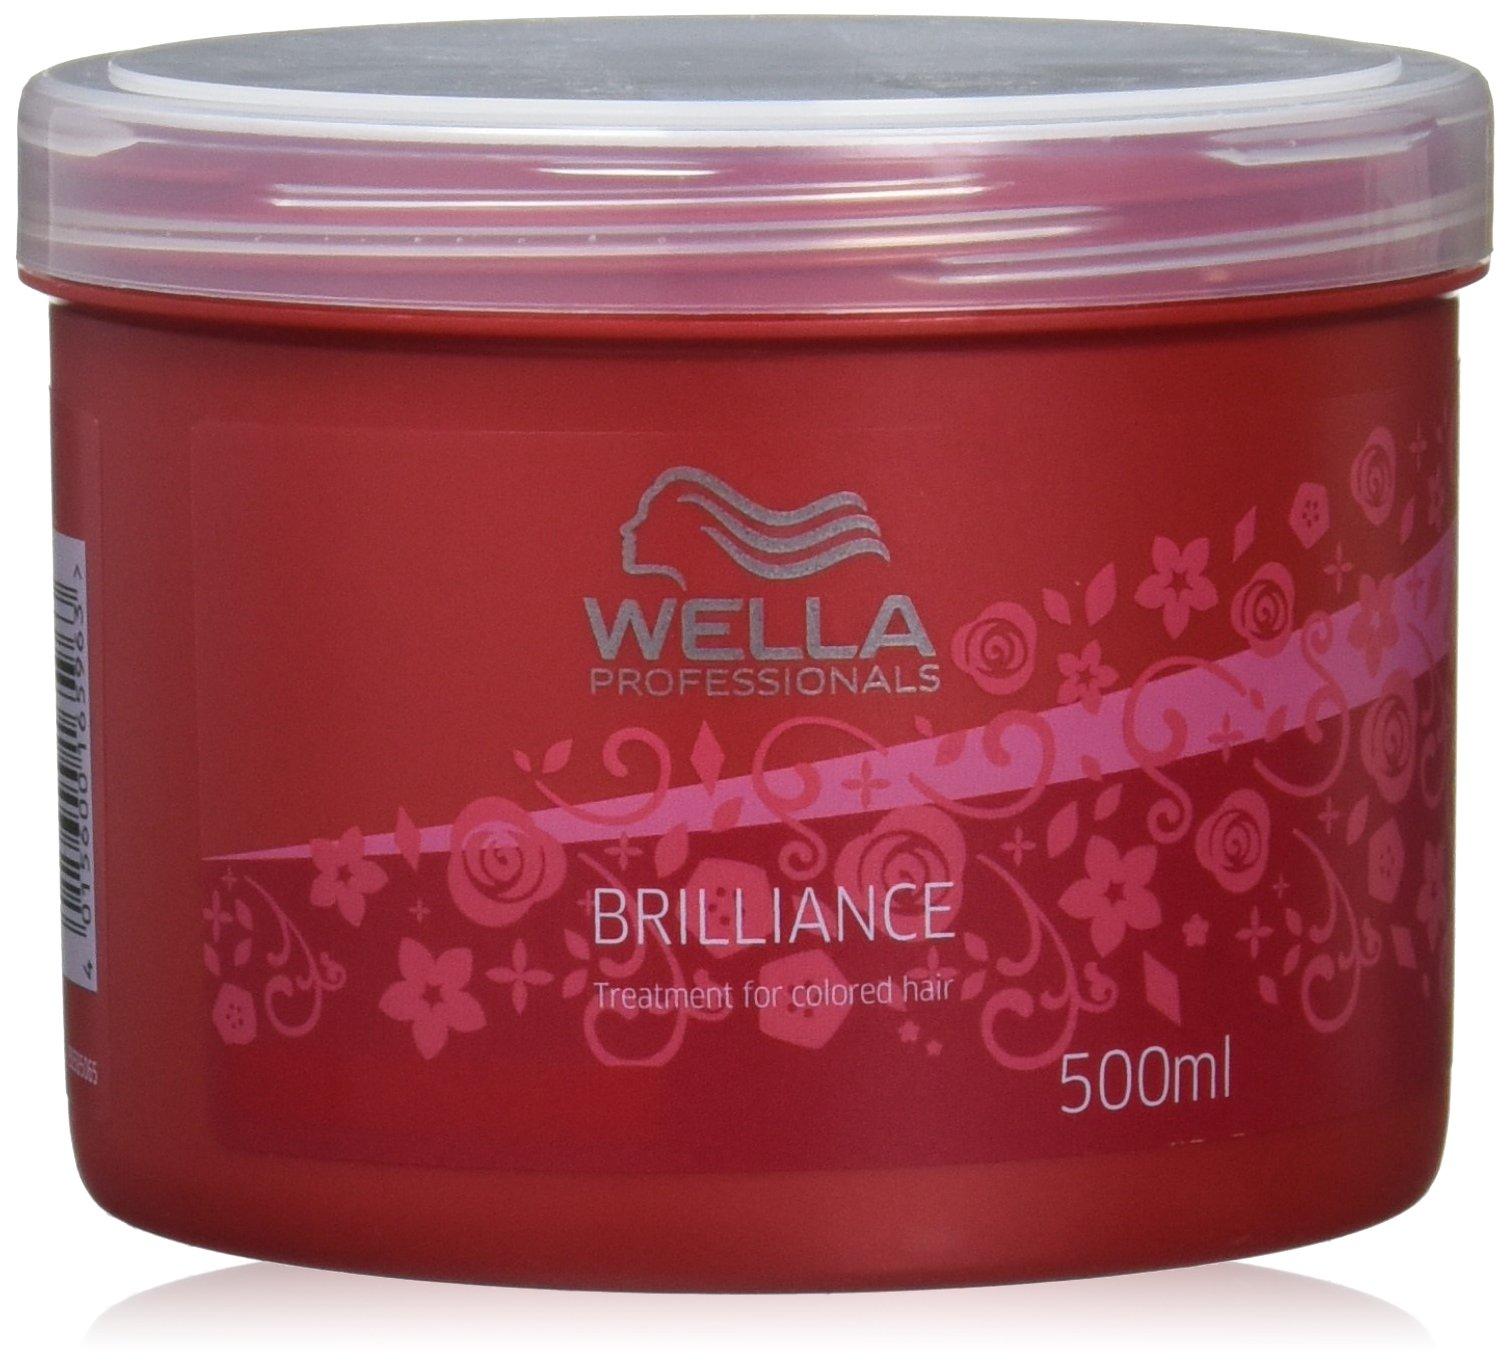 Wella Brilliance Treatment, 17 Ounce by Wella